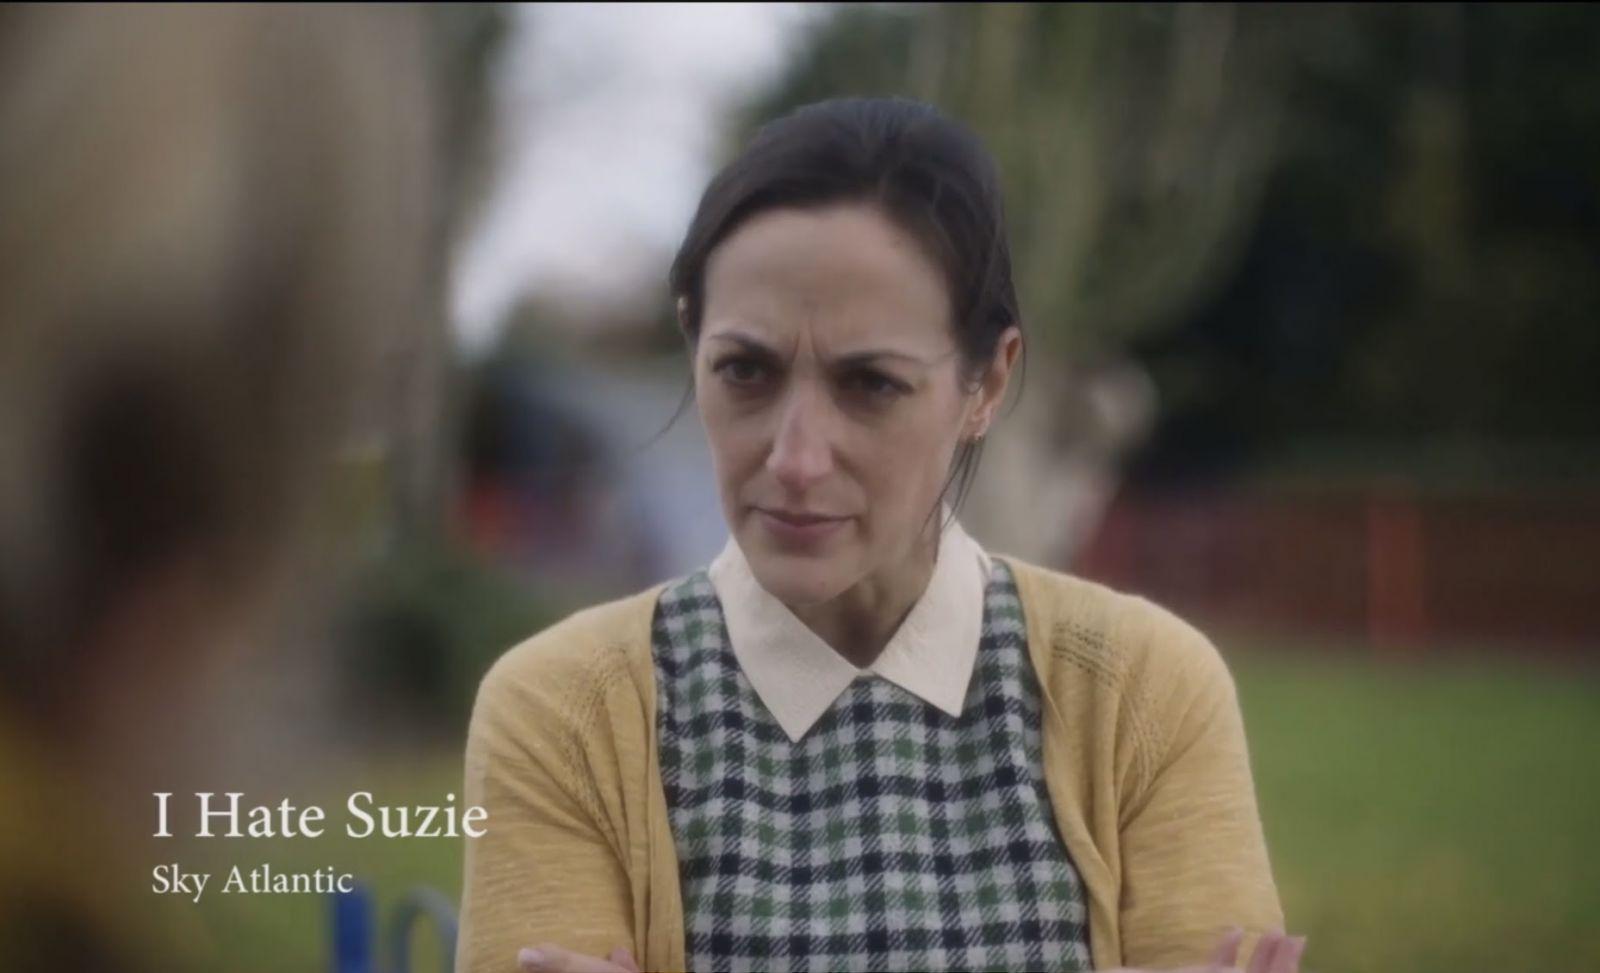 I HATE SUZIE (BADWOLF) - Mrs Parlon